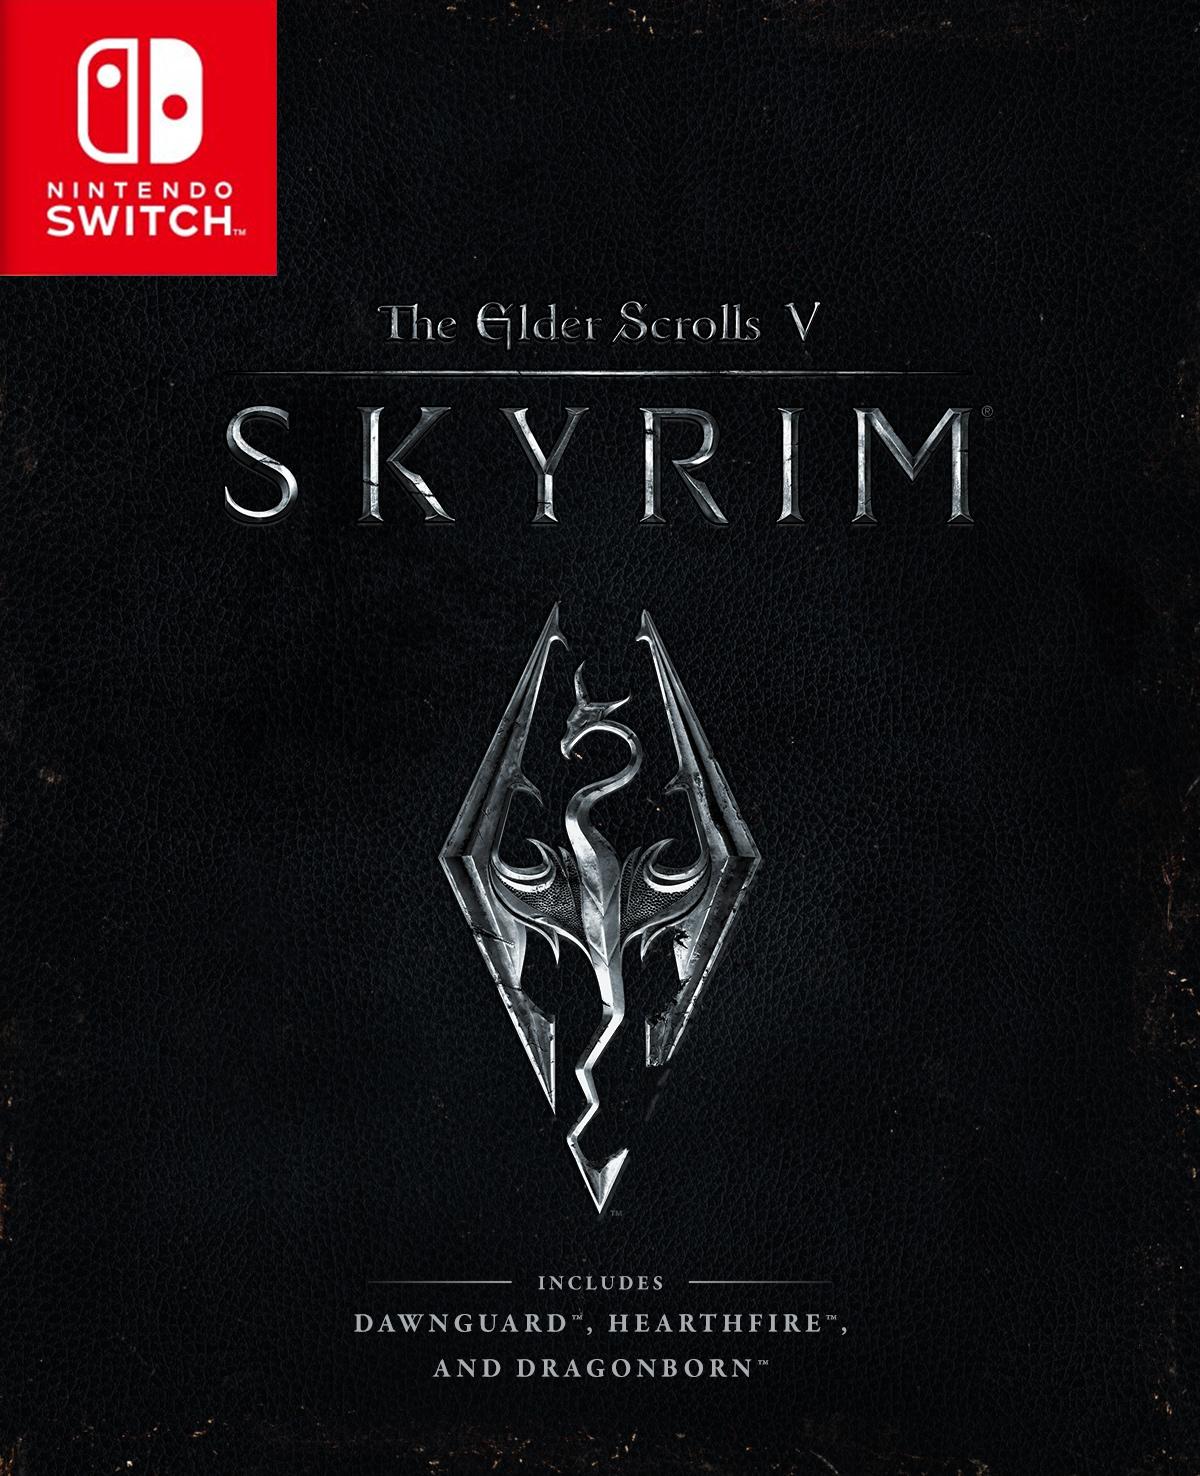 TES-Skyrim-Switch_boxart-template-1200x1476.jpg